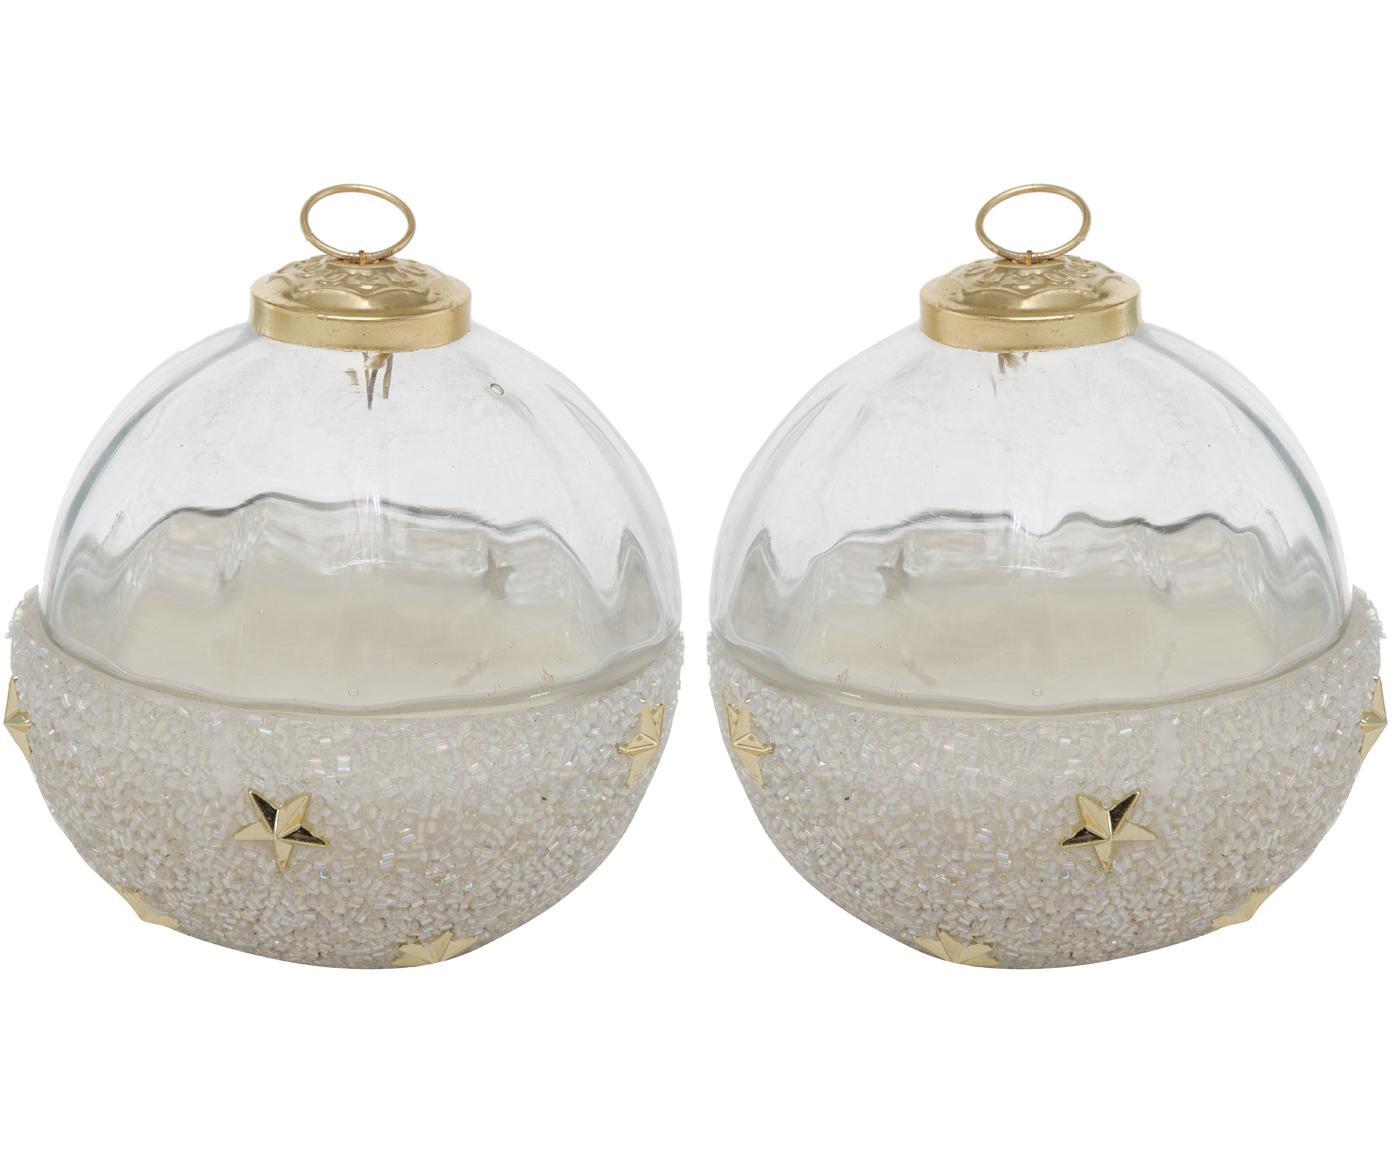 Geurkaarsenset Arlington (granaatappel & cranberry), 2-delig, Houder: gelakt glas, Transparant, goudkleurig, wit, Beide Ø 10 cm